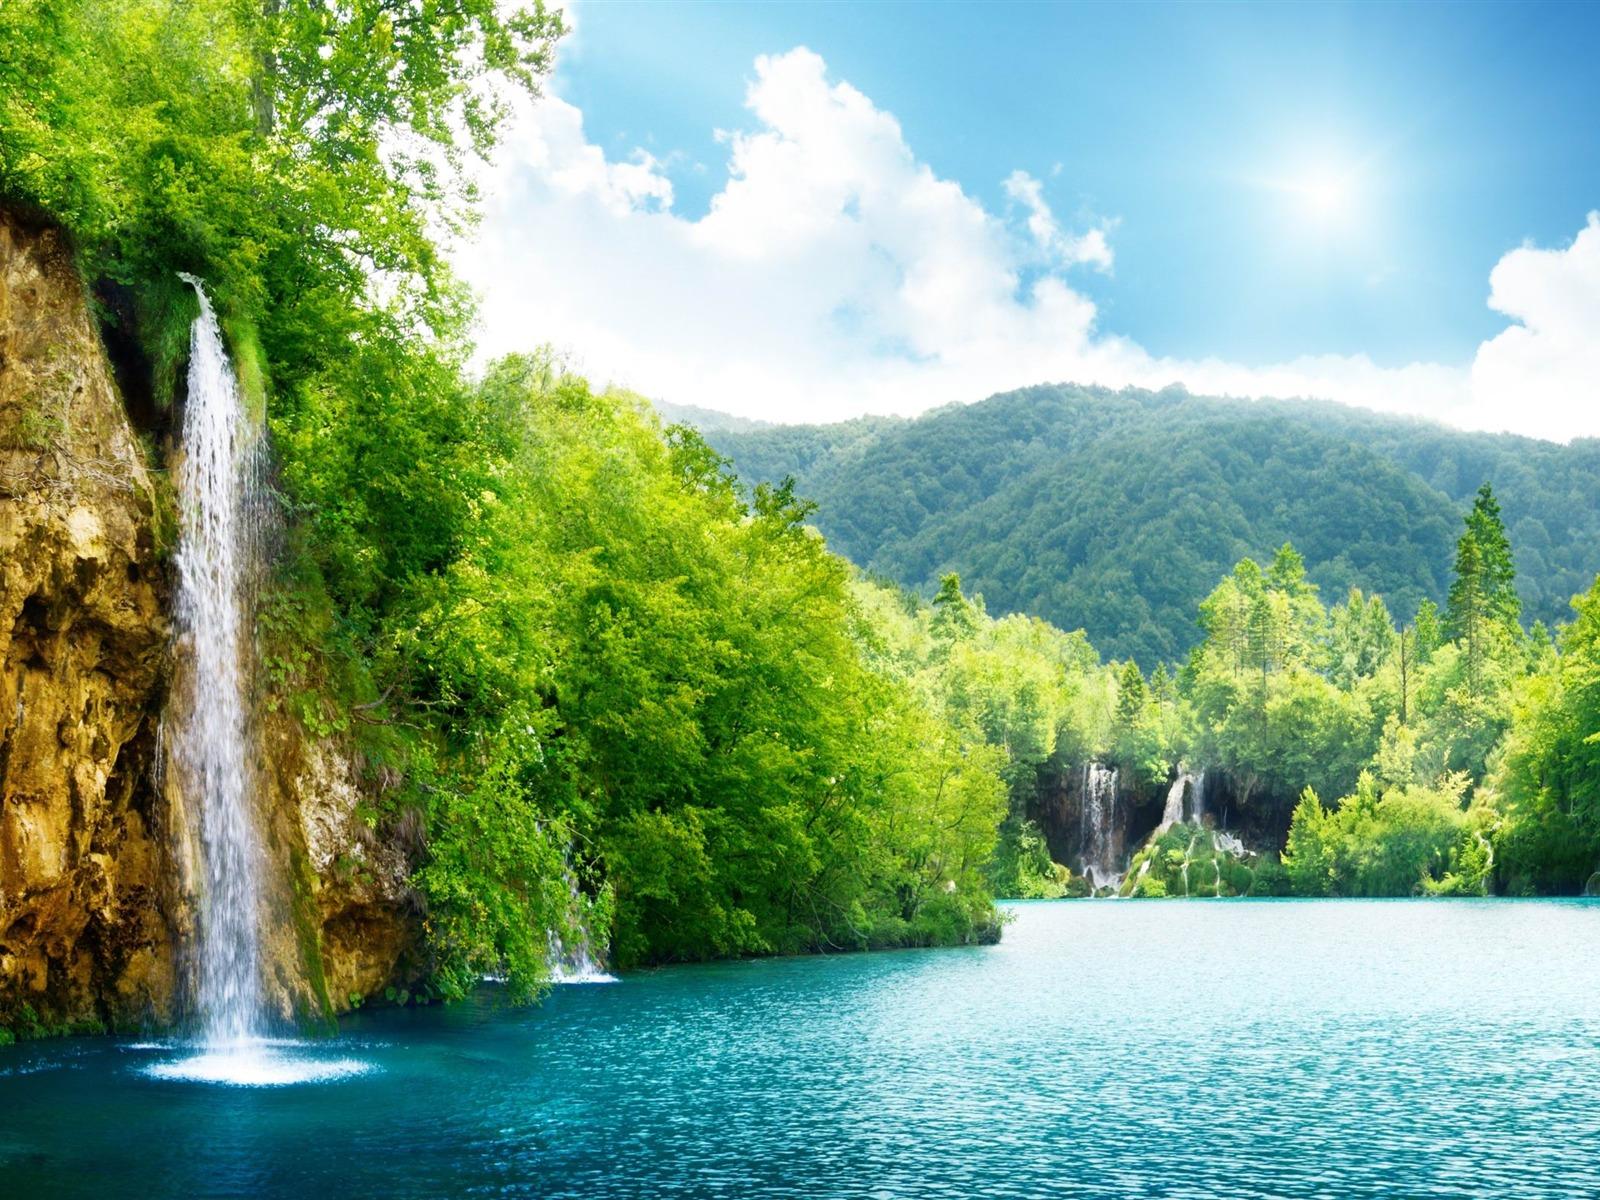 Cascade lac d 39 t paysage hd fond d 39 cran 1600x1200 for Fond ecran ete hd